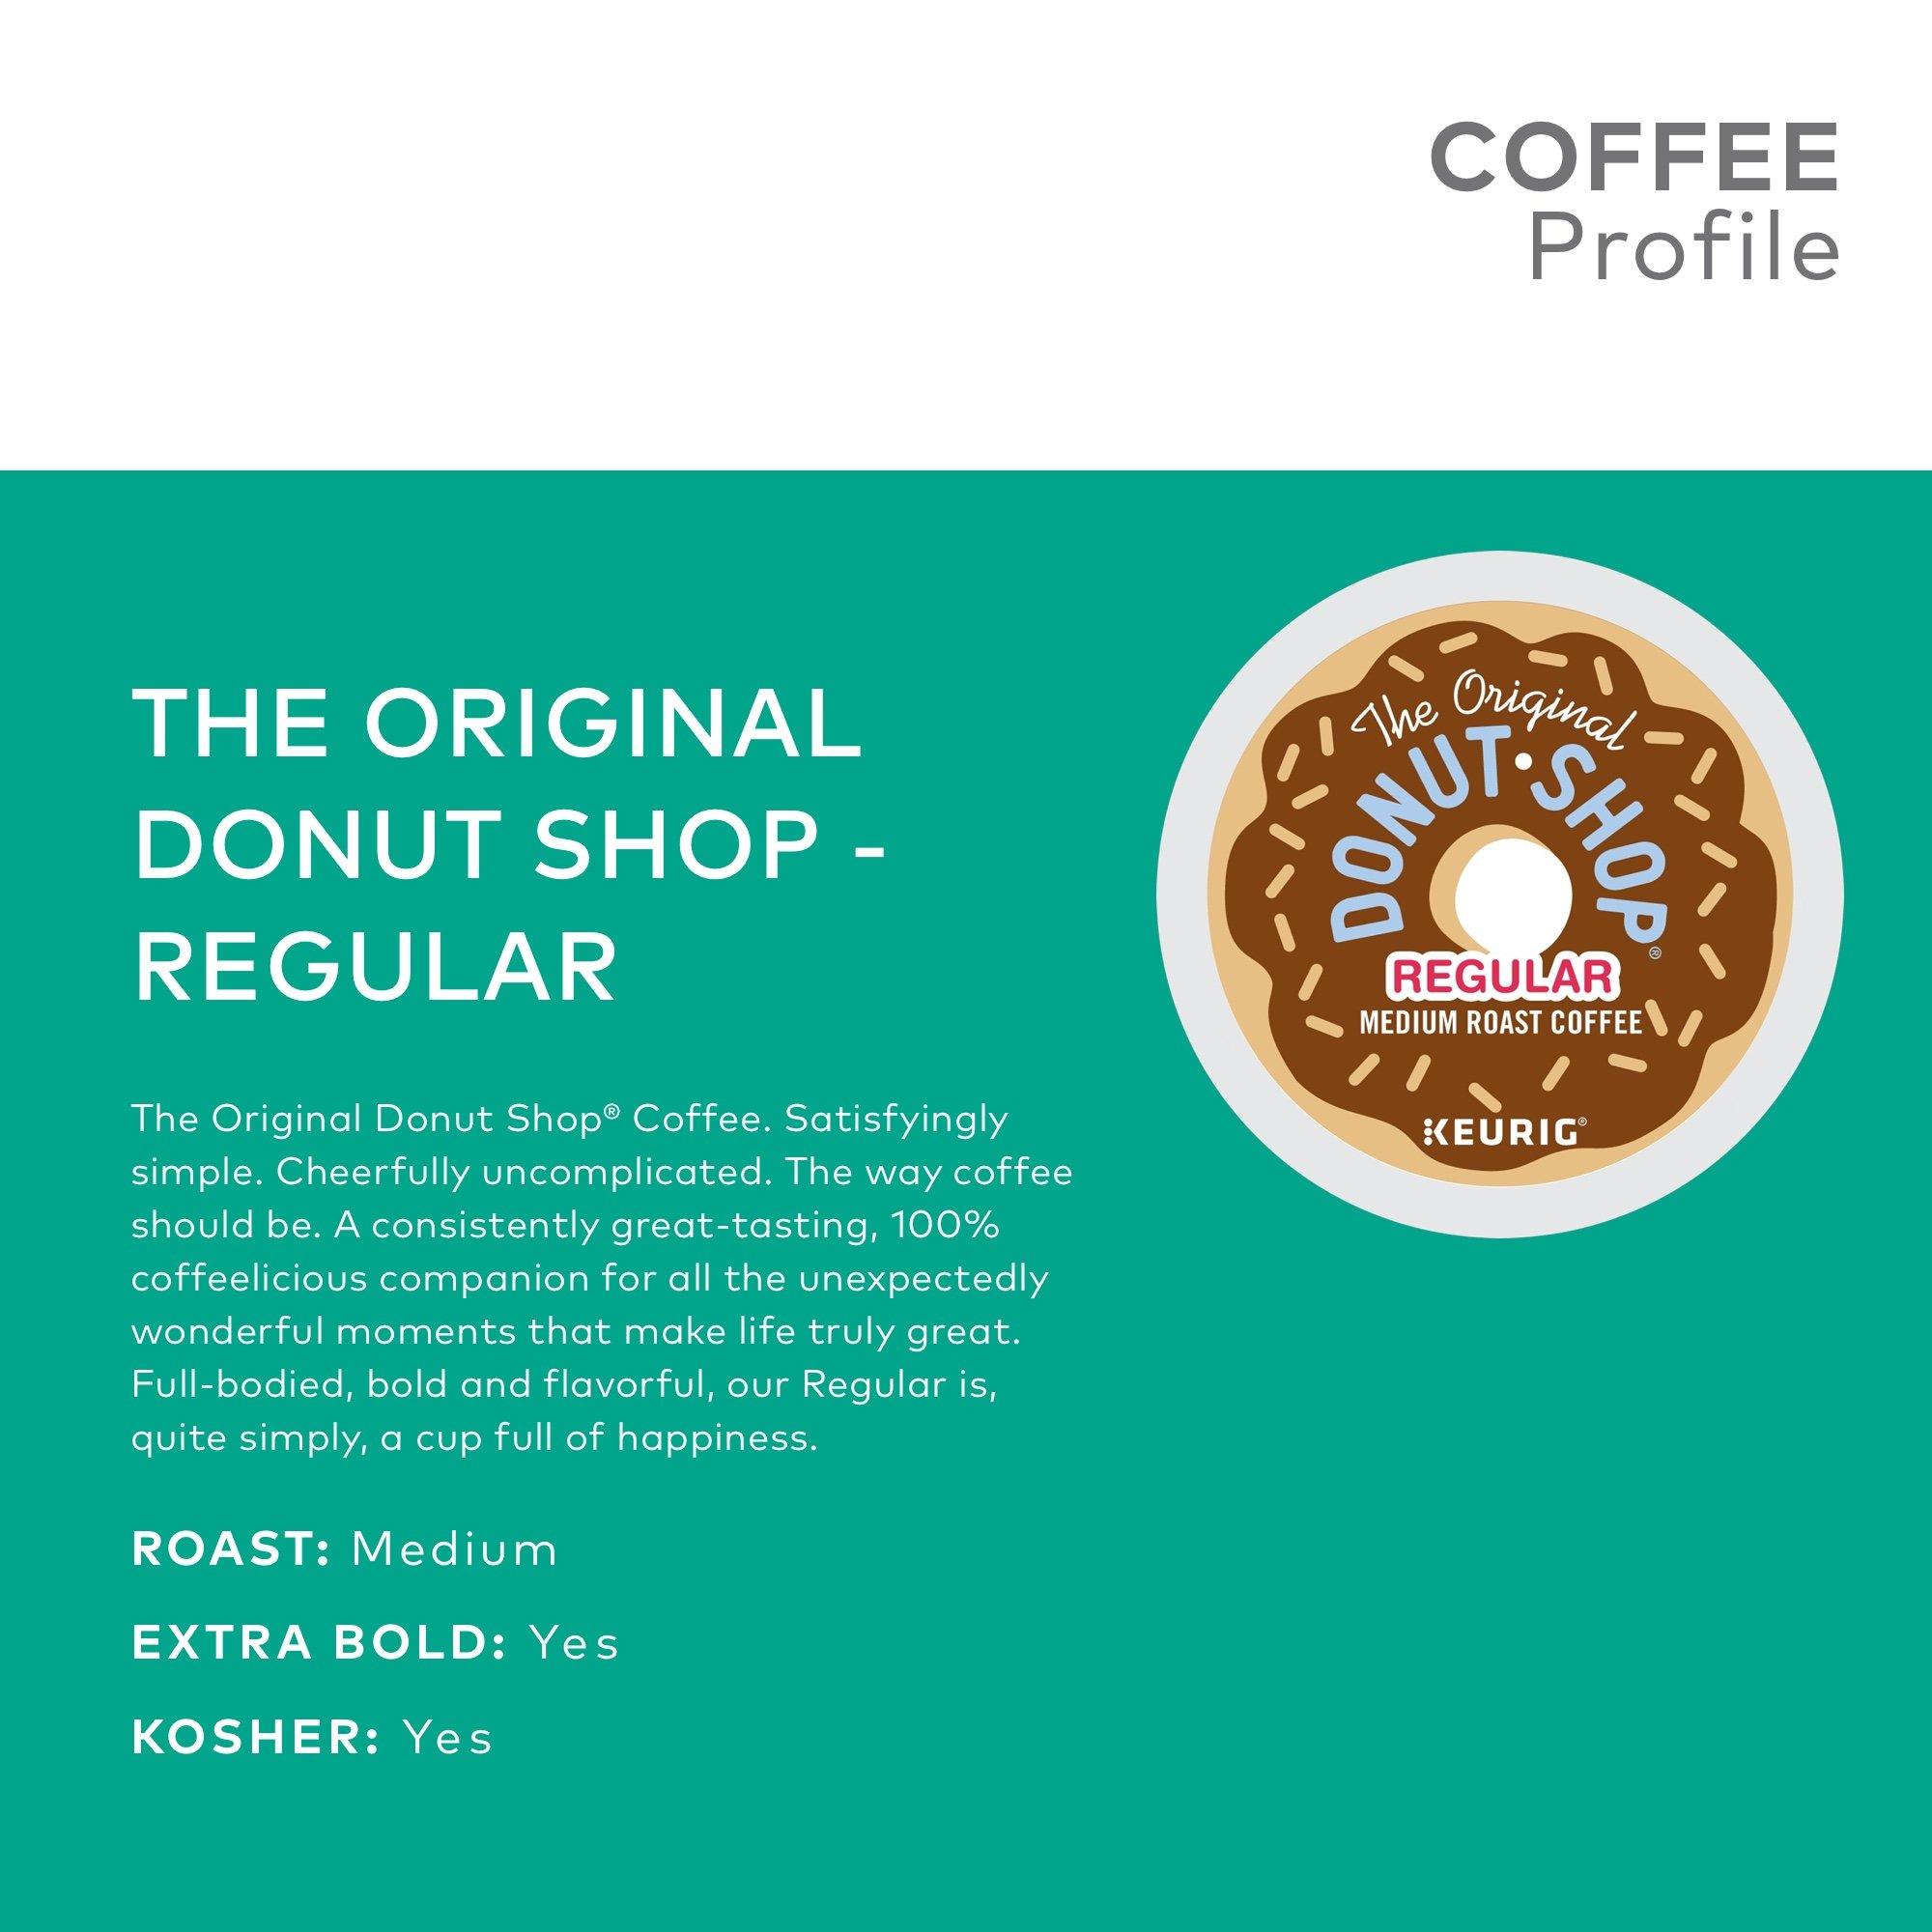 The Original Donut Shop Coffee, Regular Medium Roast, K-Cup Portion Count for Keurig Brewers 24-Count (Pack of 4) by The Original Donut Shop (Image #5)